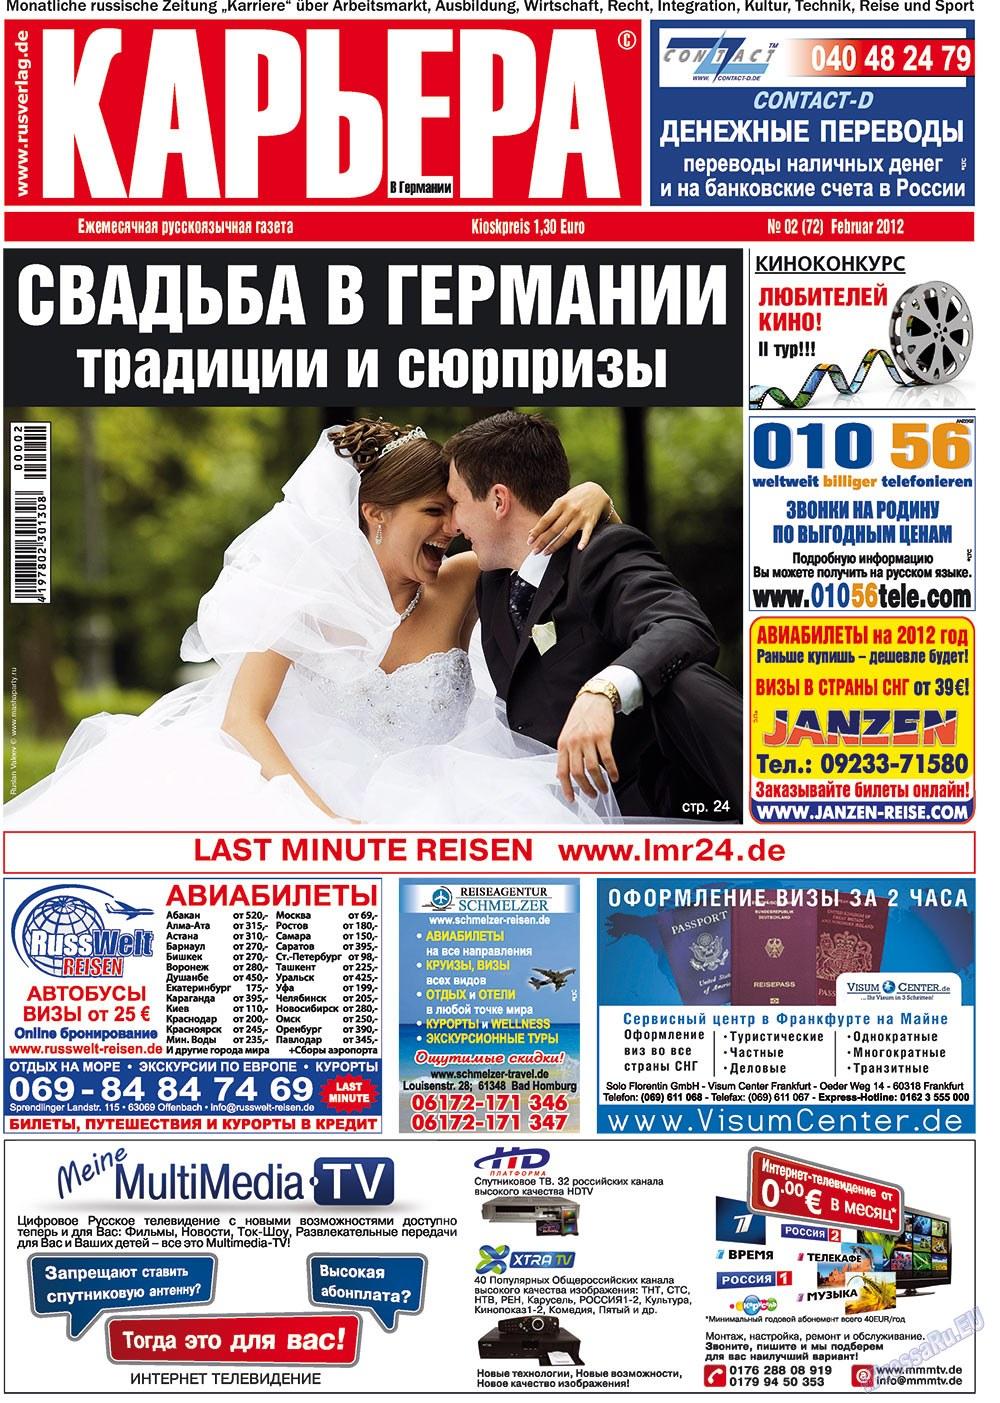 Карьера (газета). 2012 год, номер 2, стр. 1